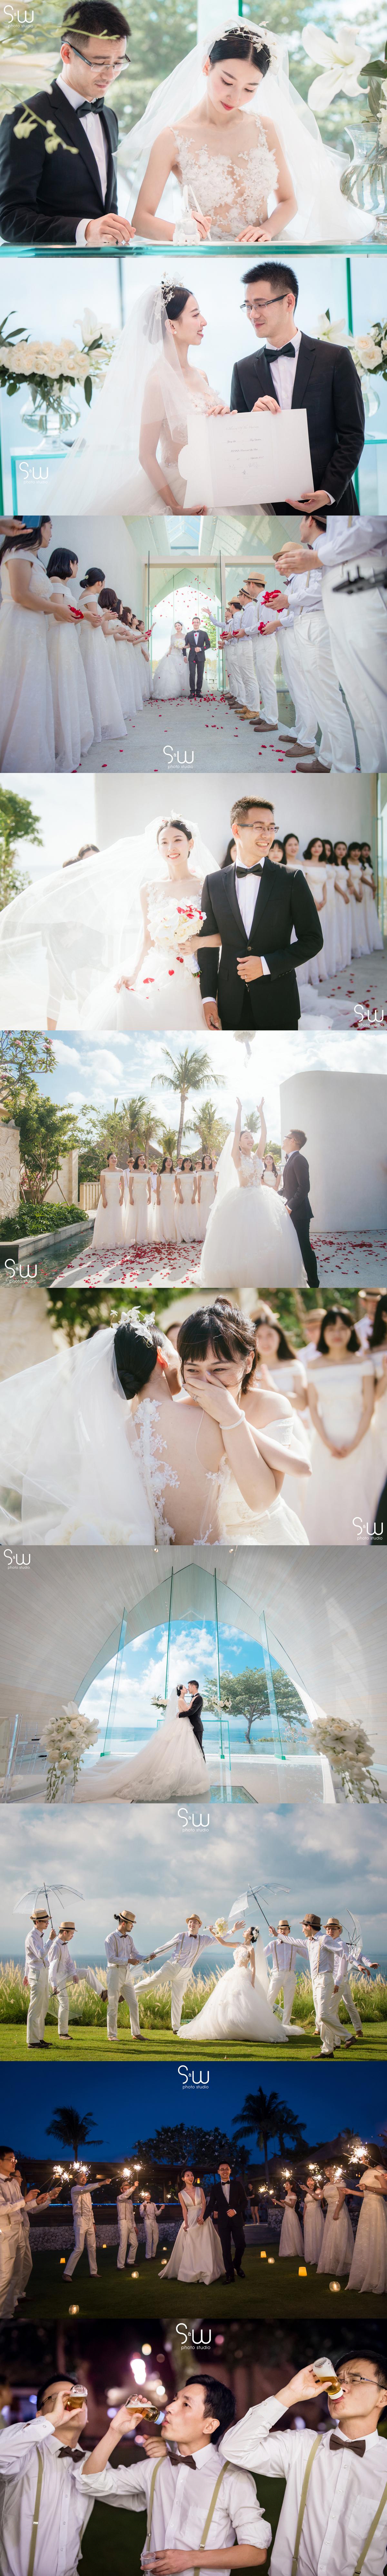 WEDDING | Ayana Wedding Villa, Bali (峇里島婚禮) | sw photo studio 婚禮, 婚攝, 婚紗, 海外婚禮, 海外婚紗, 海島婚禮,峇里島婚禮, 峇里島婚紗, 台灣婚禮, 婚攝推薦